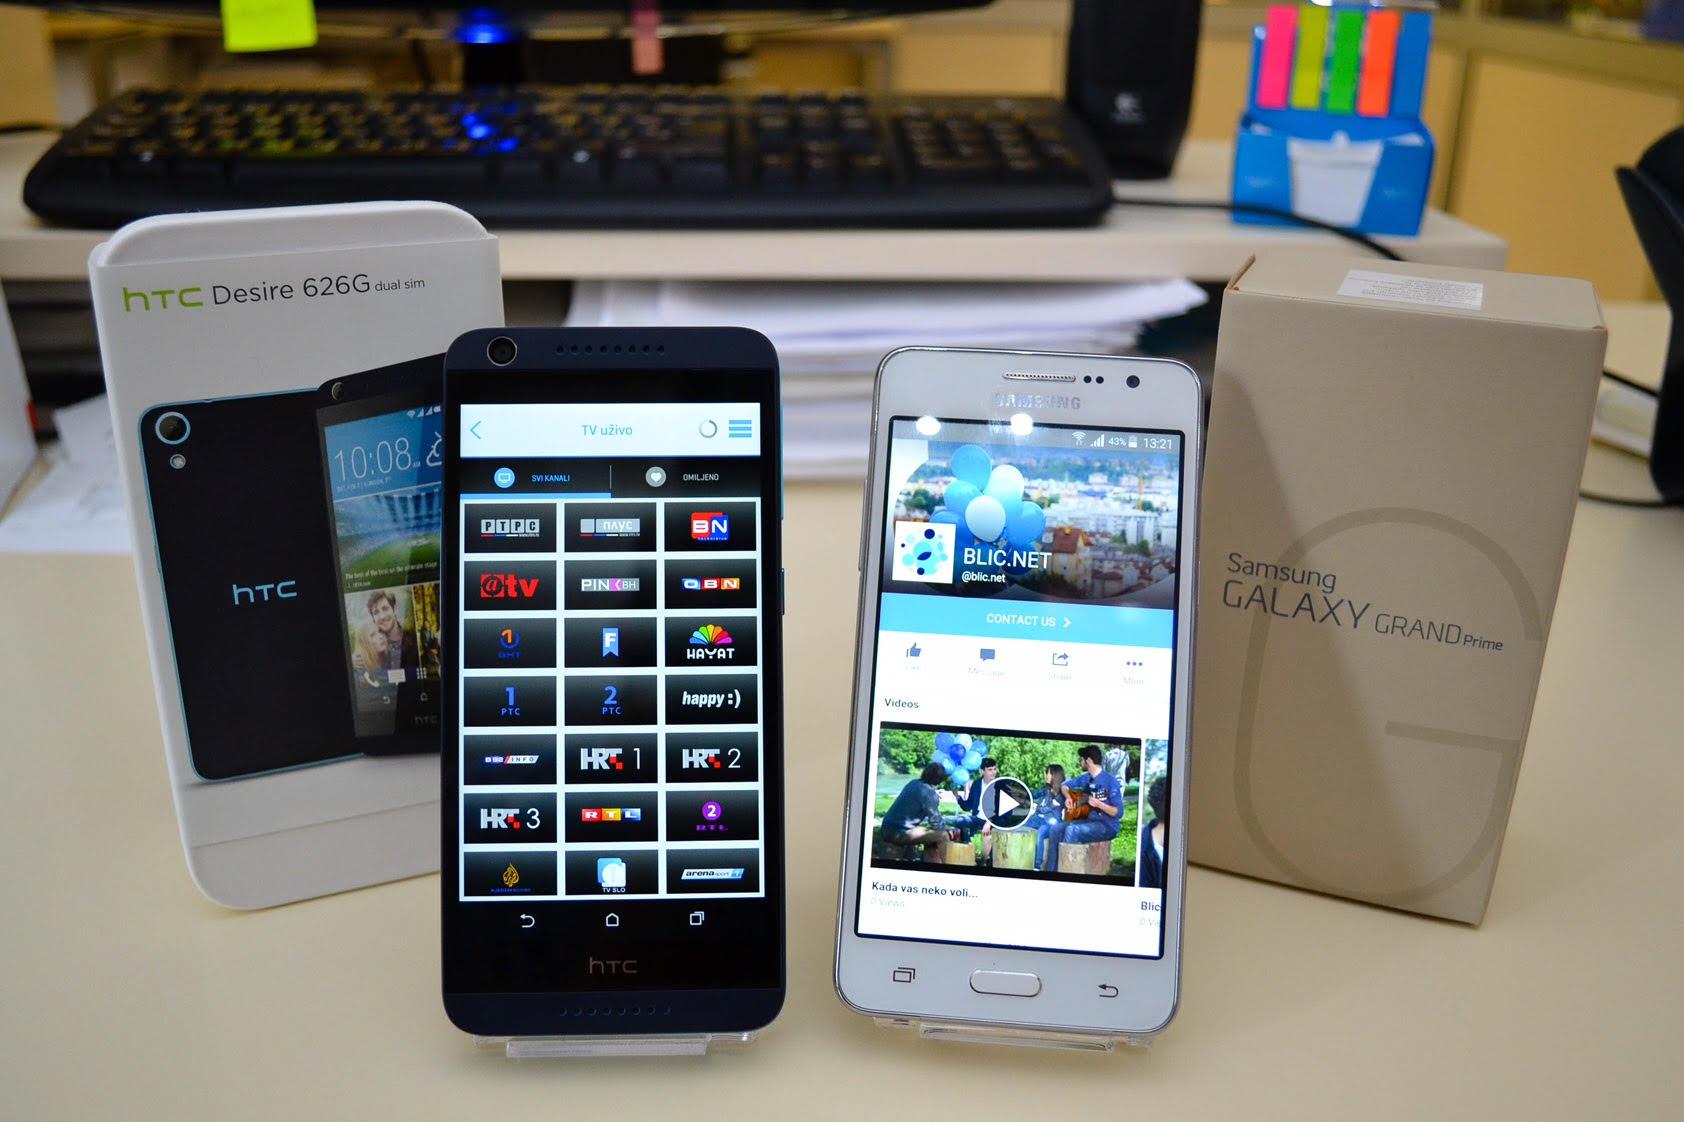 Blicnet: Odlični telefoni po odličnim cijenama